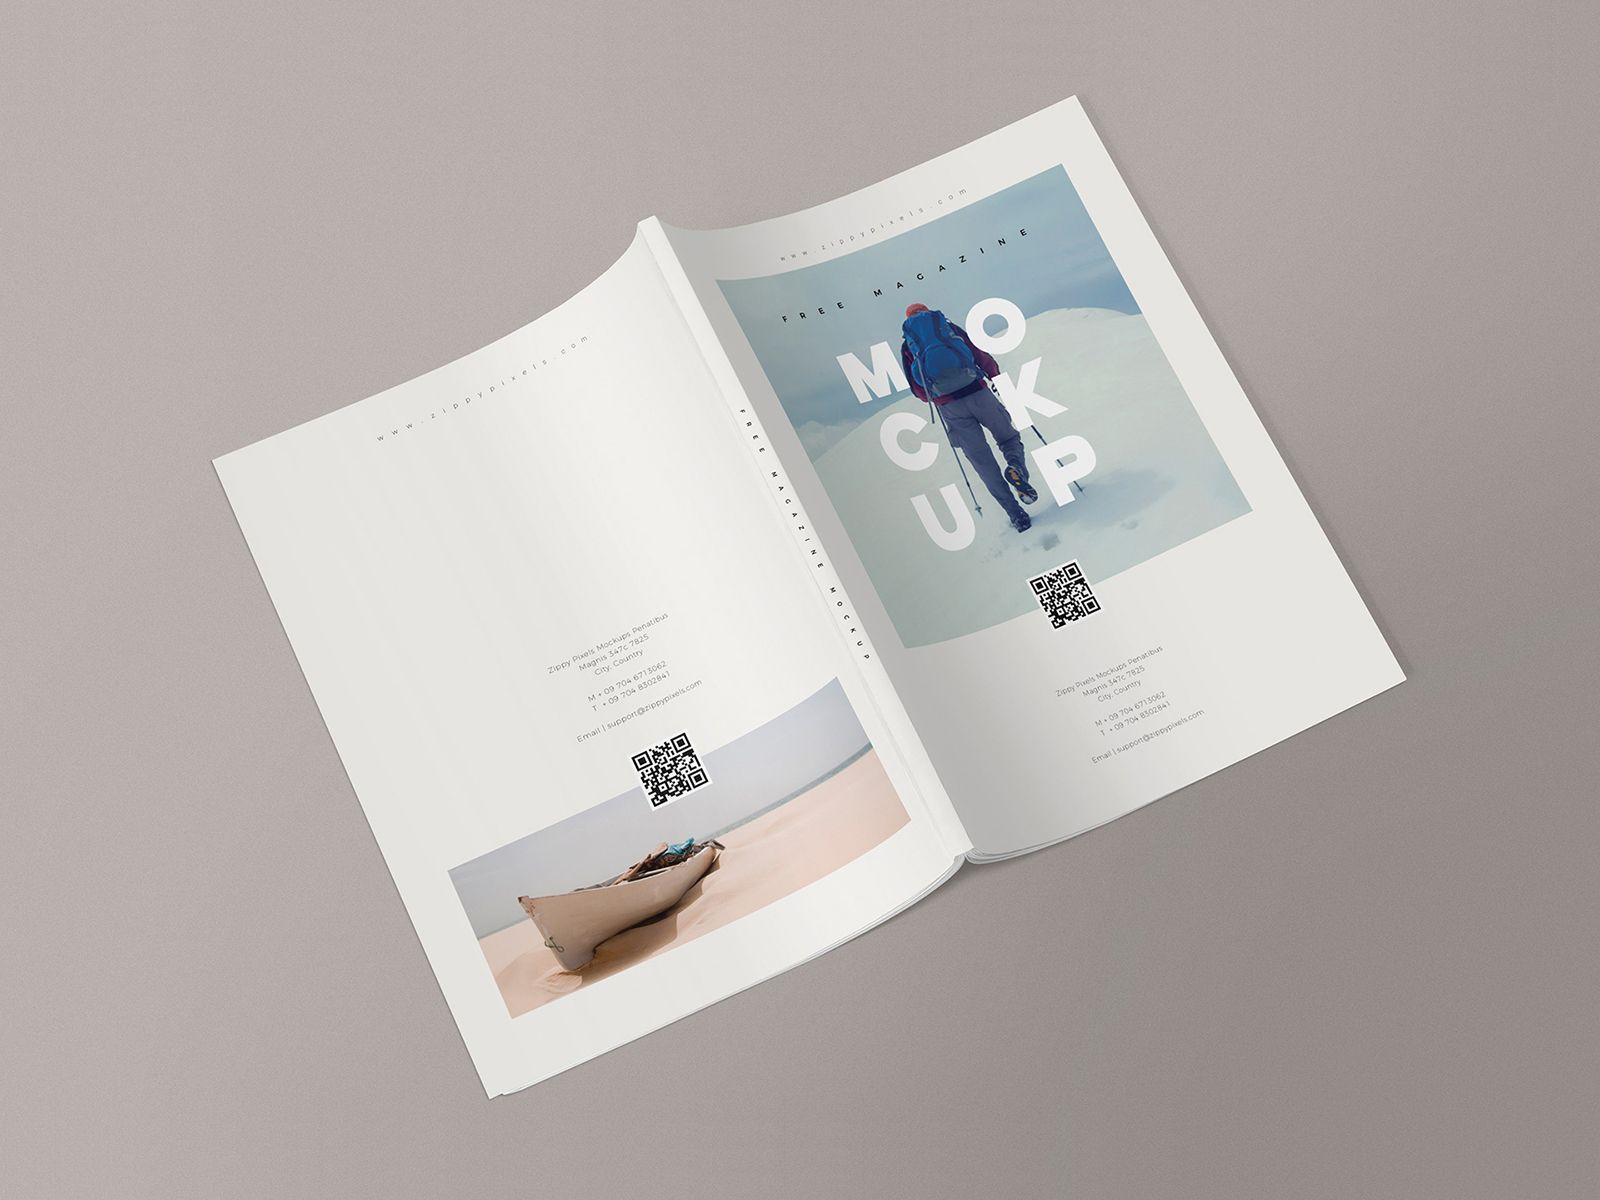 Free Magazine Mockup Templates Free Mockup Magazine Mockup Brochure Mockup Free Magazine Design